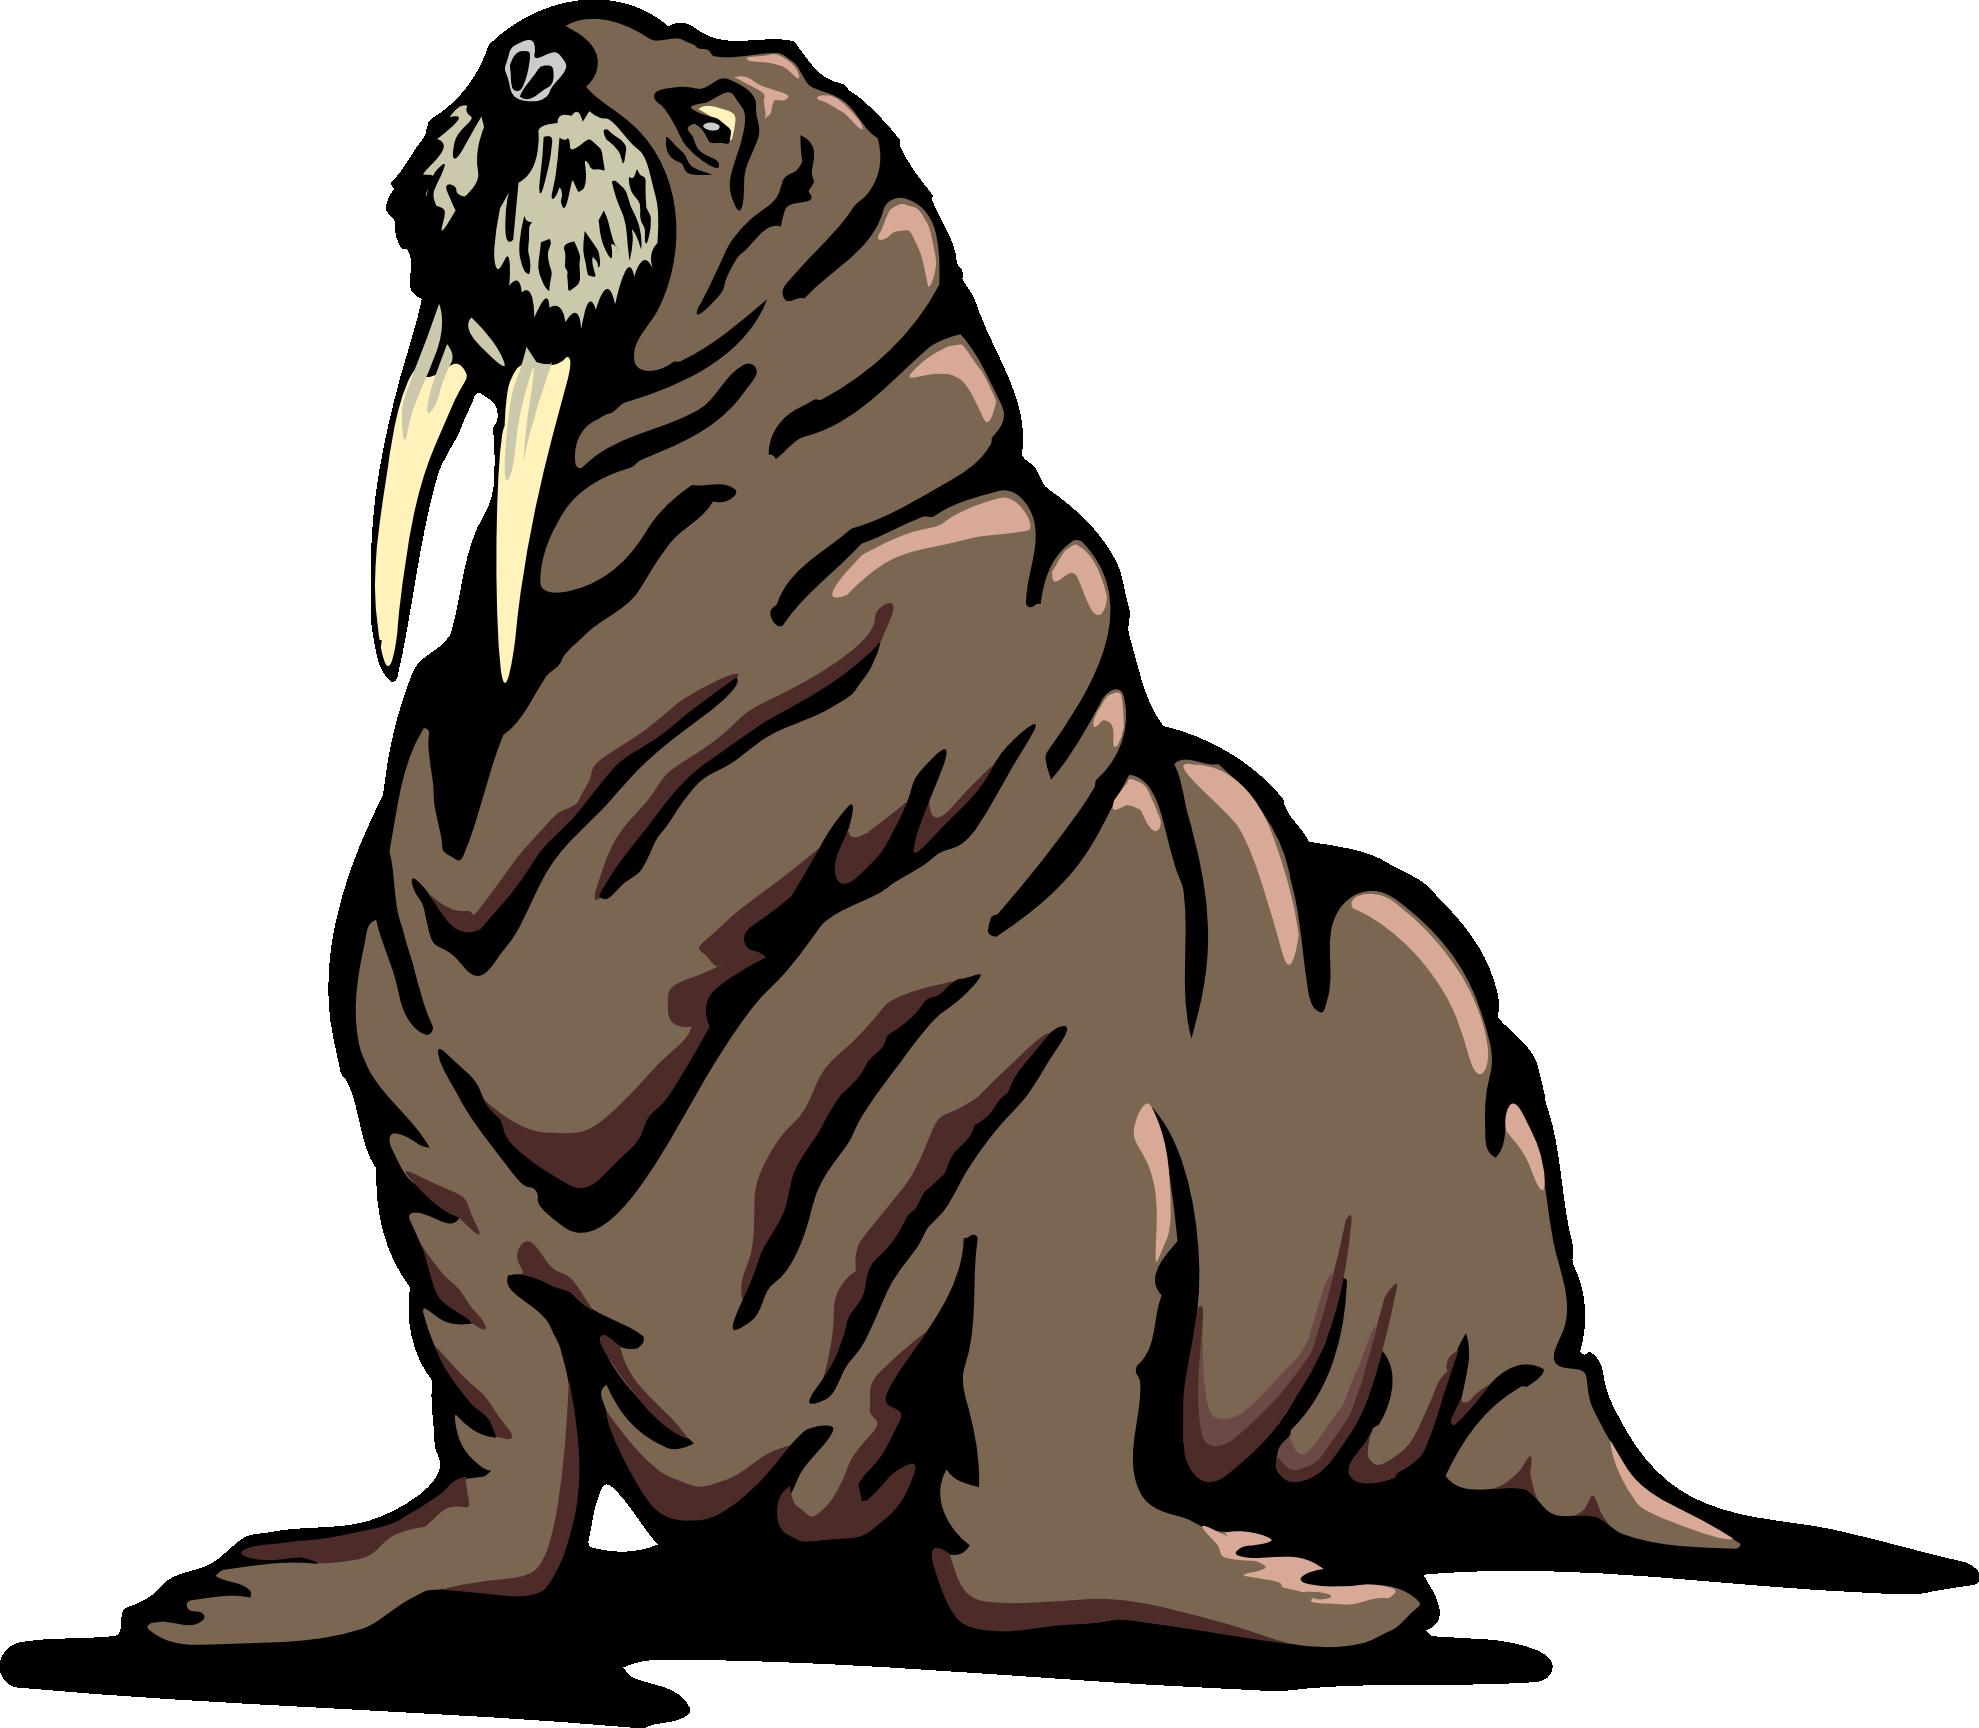 Transparent png mart. Walrus clipart object